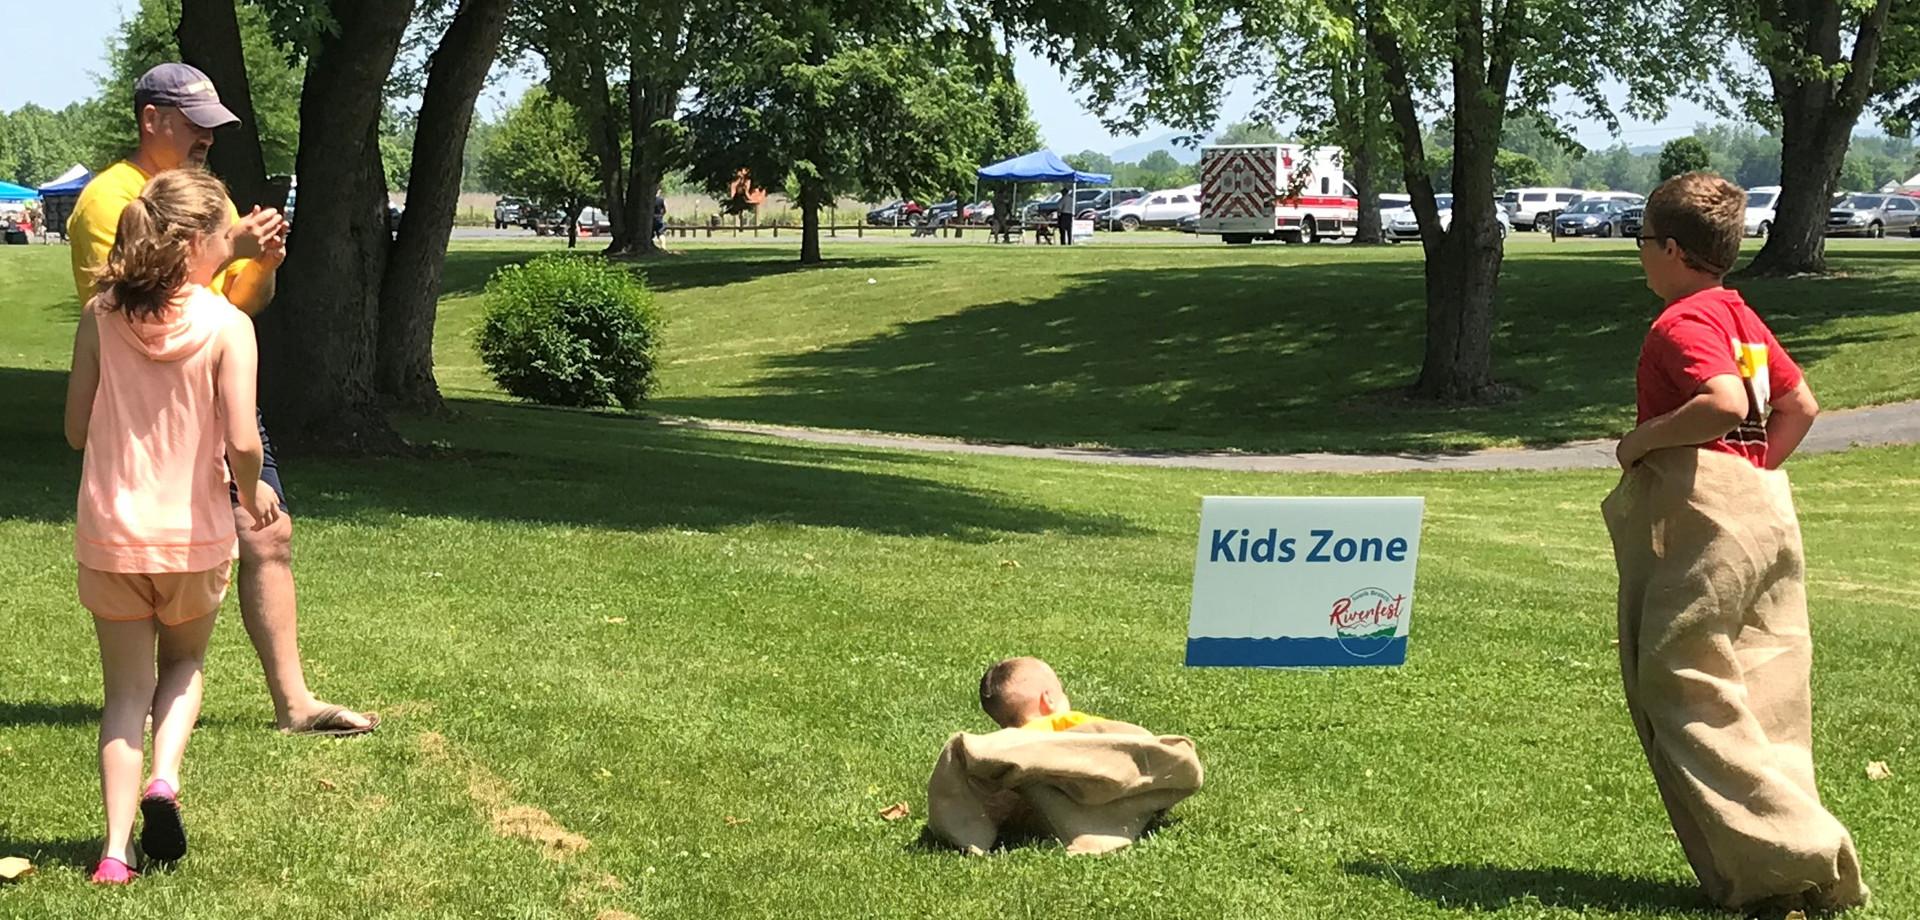 Kids sack race